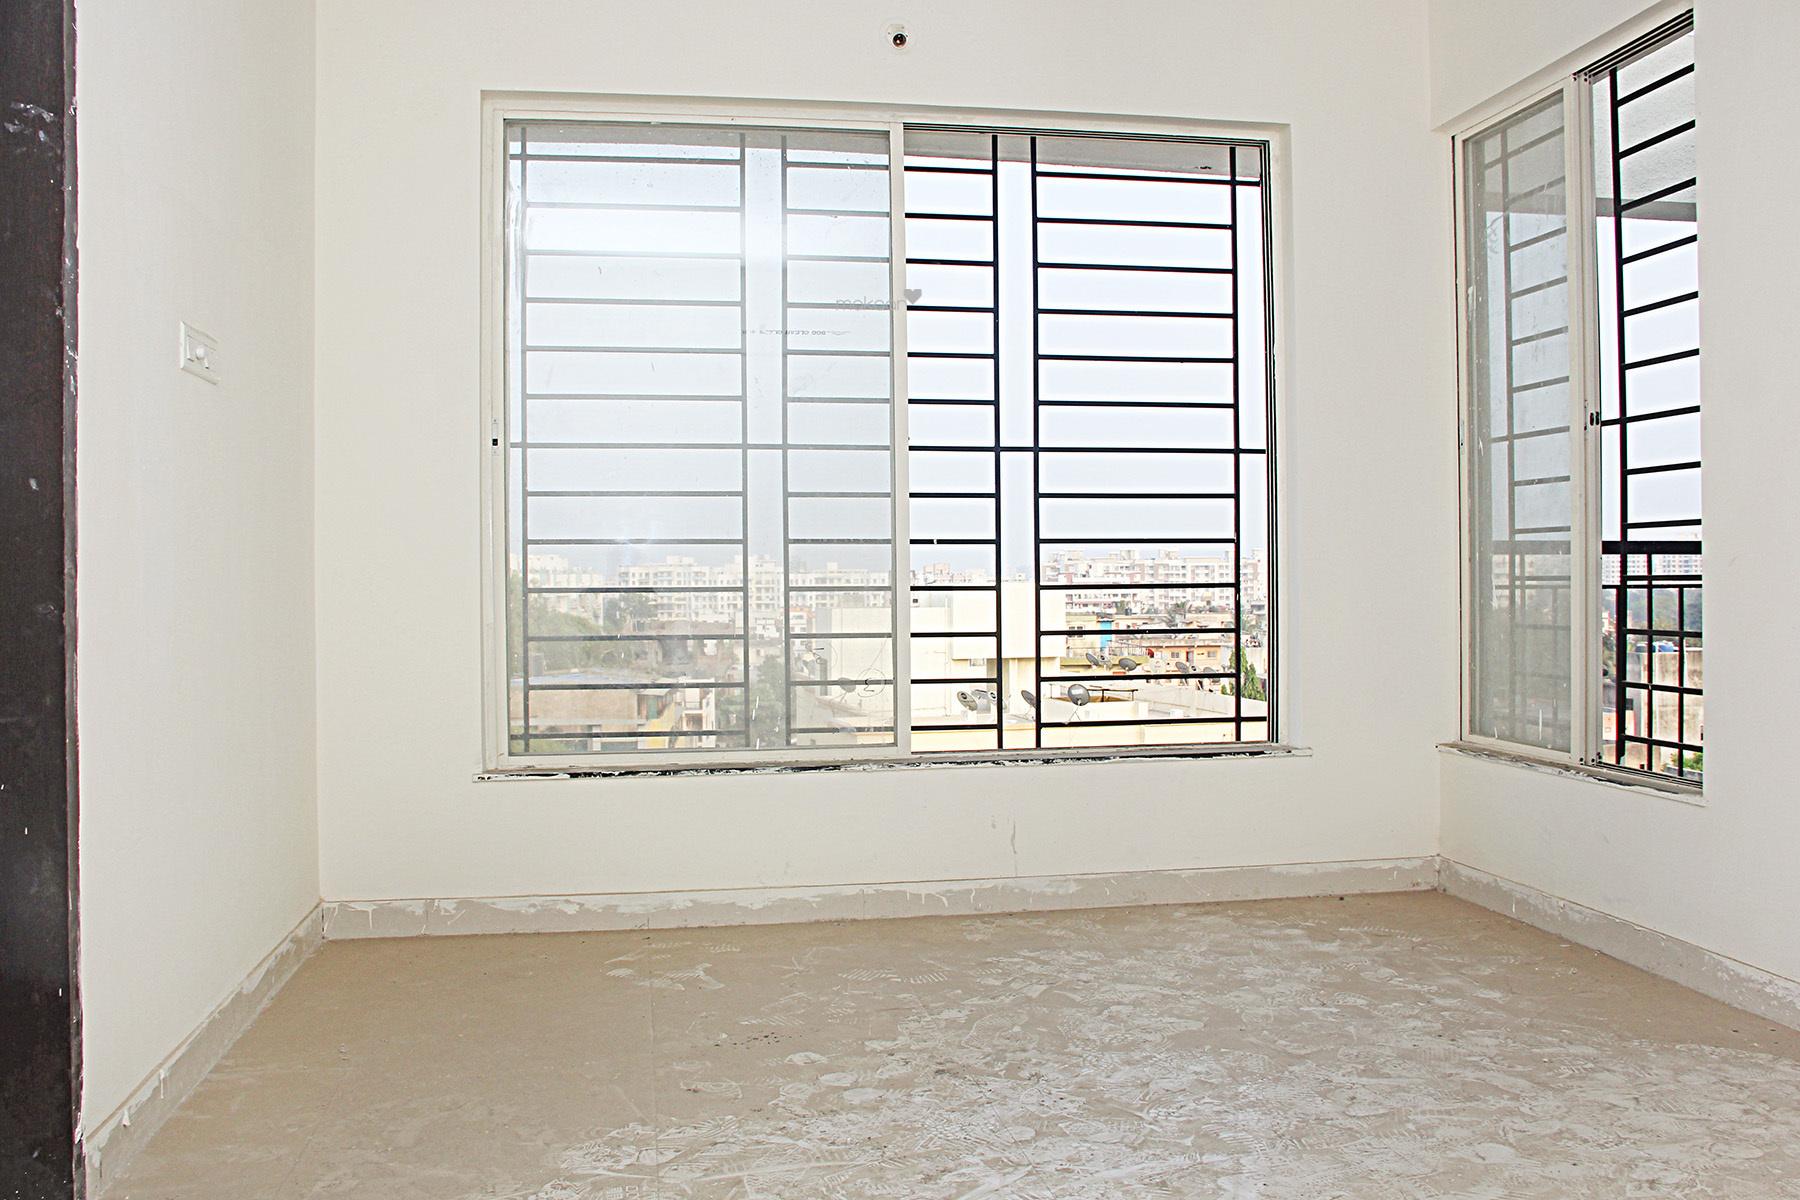 806 sq ft 2BHK 2BHK+2T (806 sq ft) Property By Proptiger In Royal Meadows, Rahatani